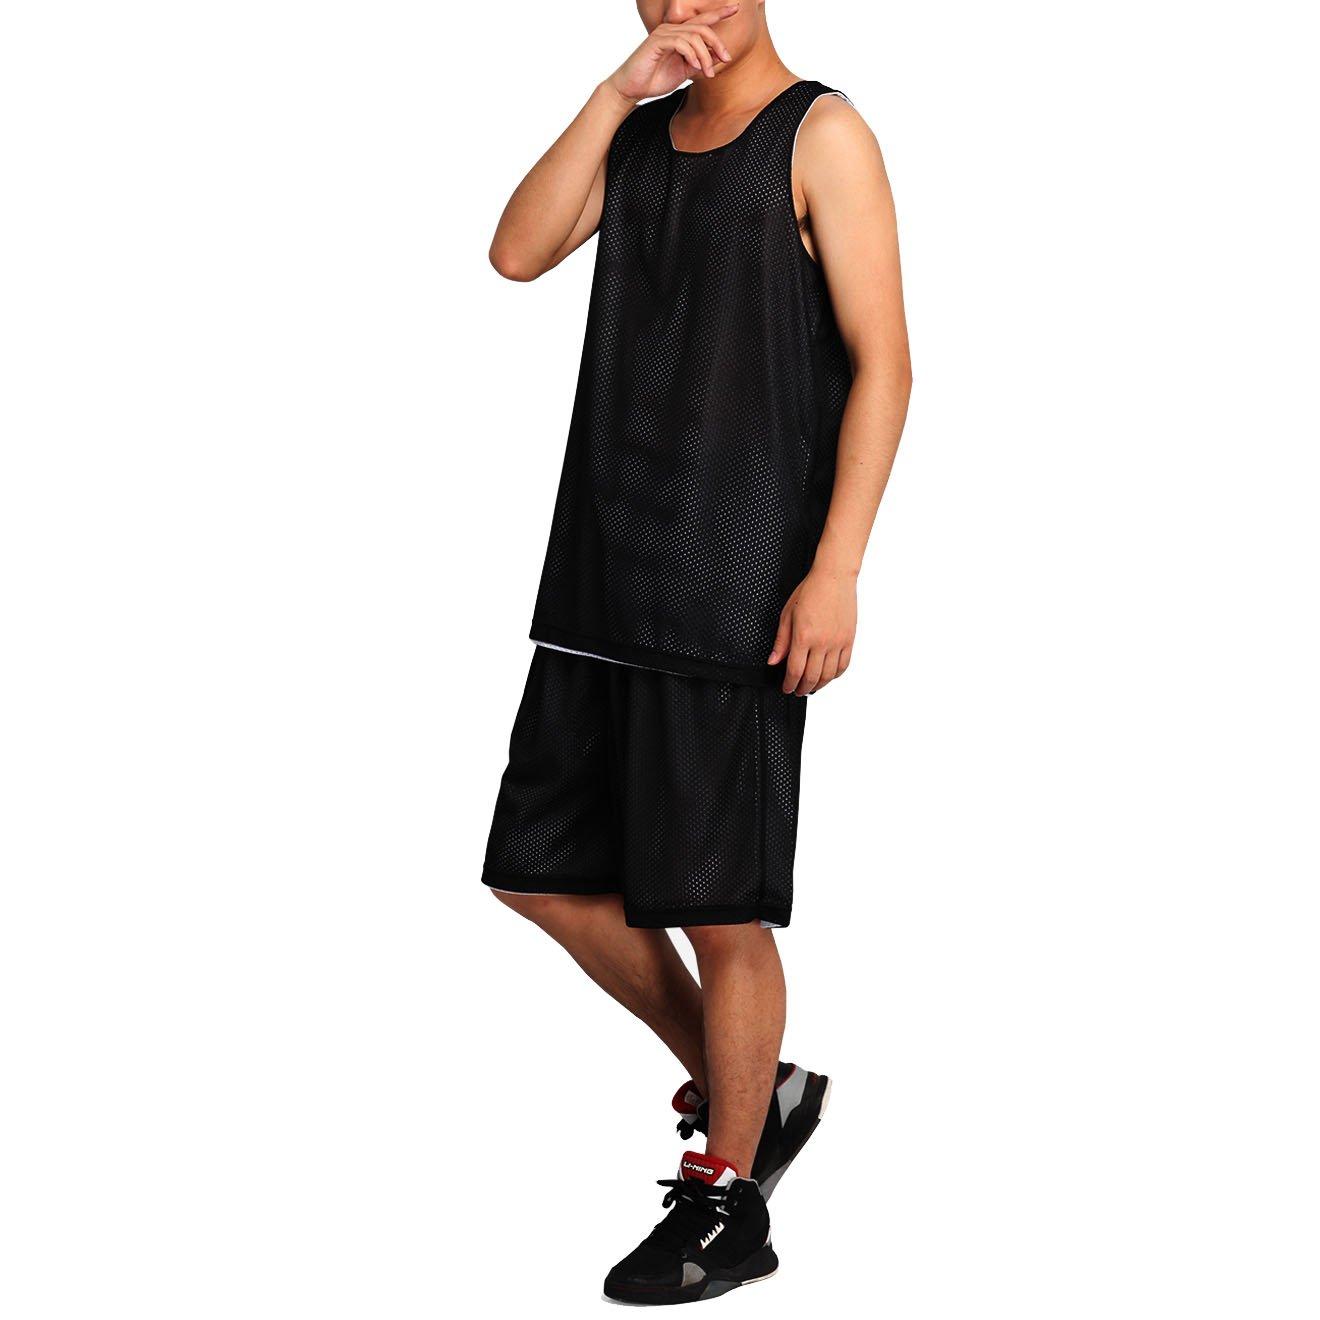 Hoerev Herren Reversible Sport Basketball Shorts Keine Taschen